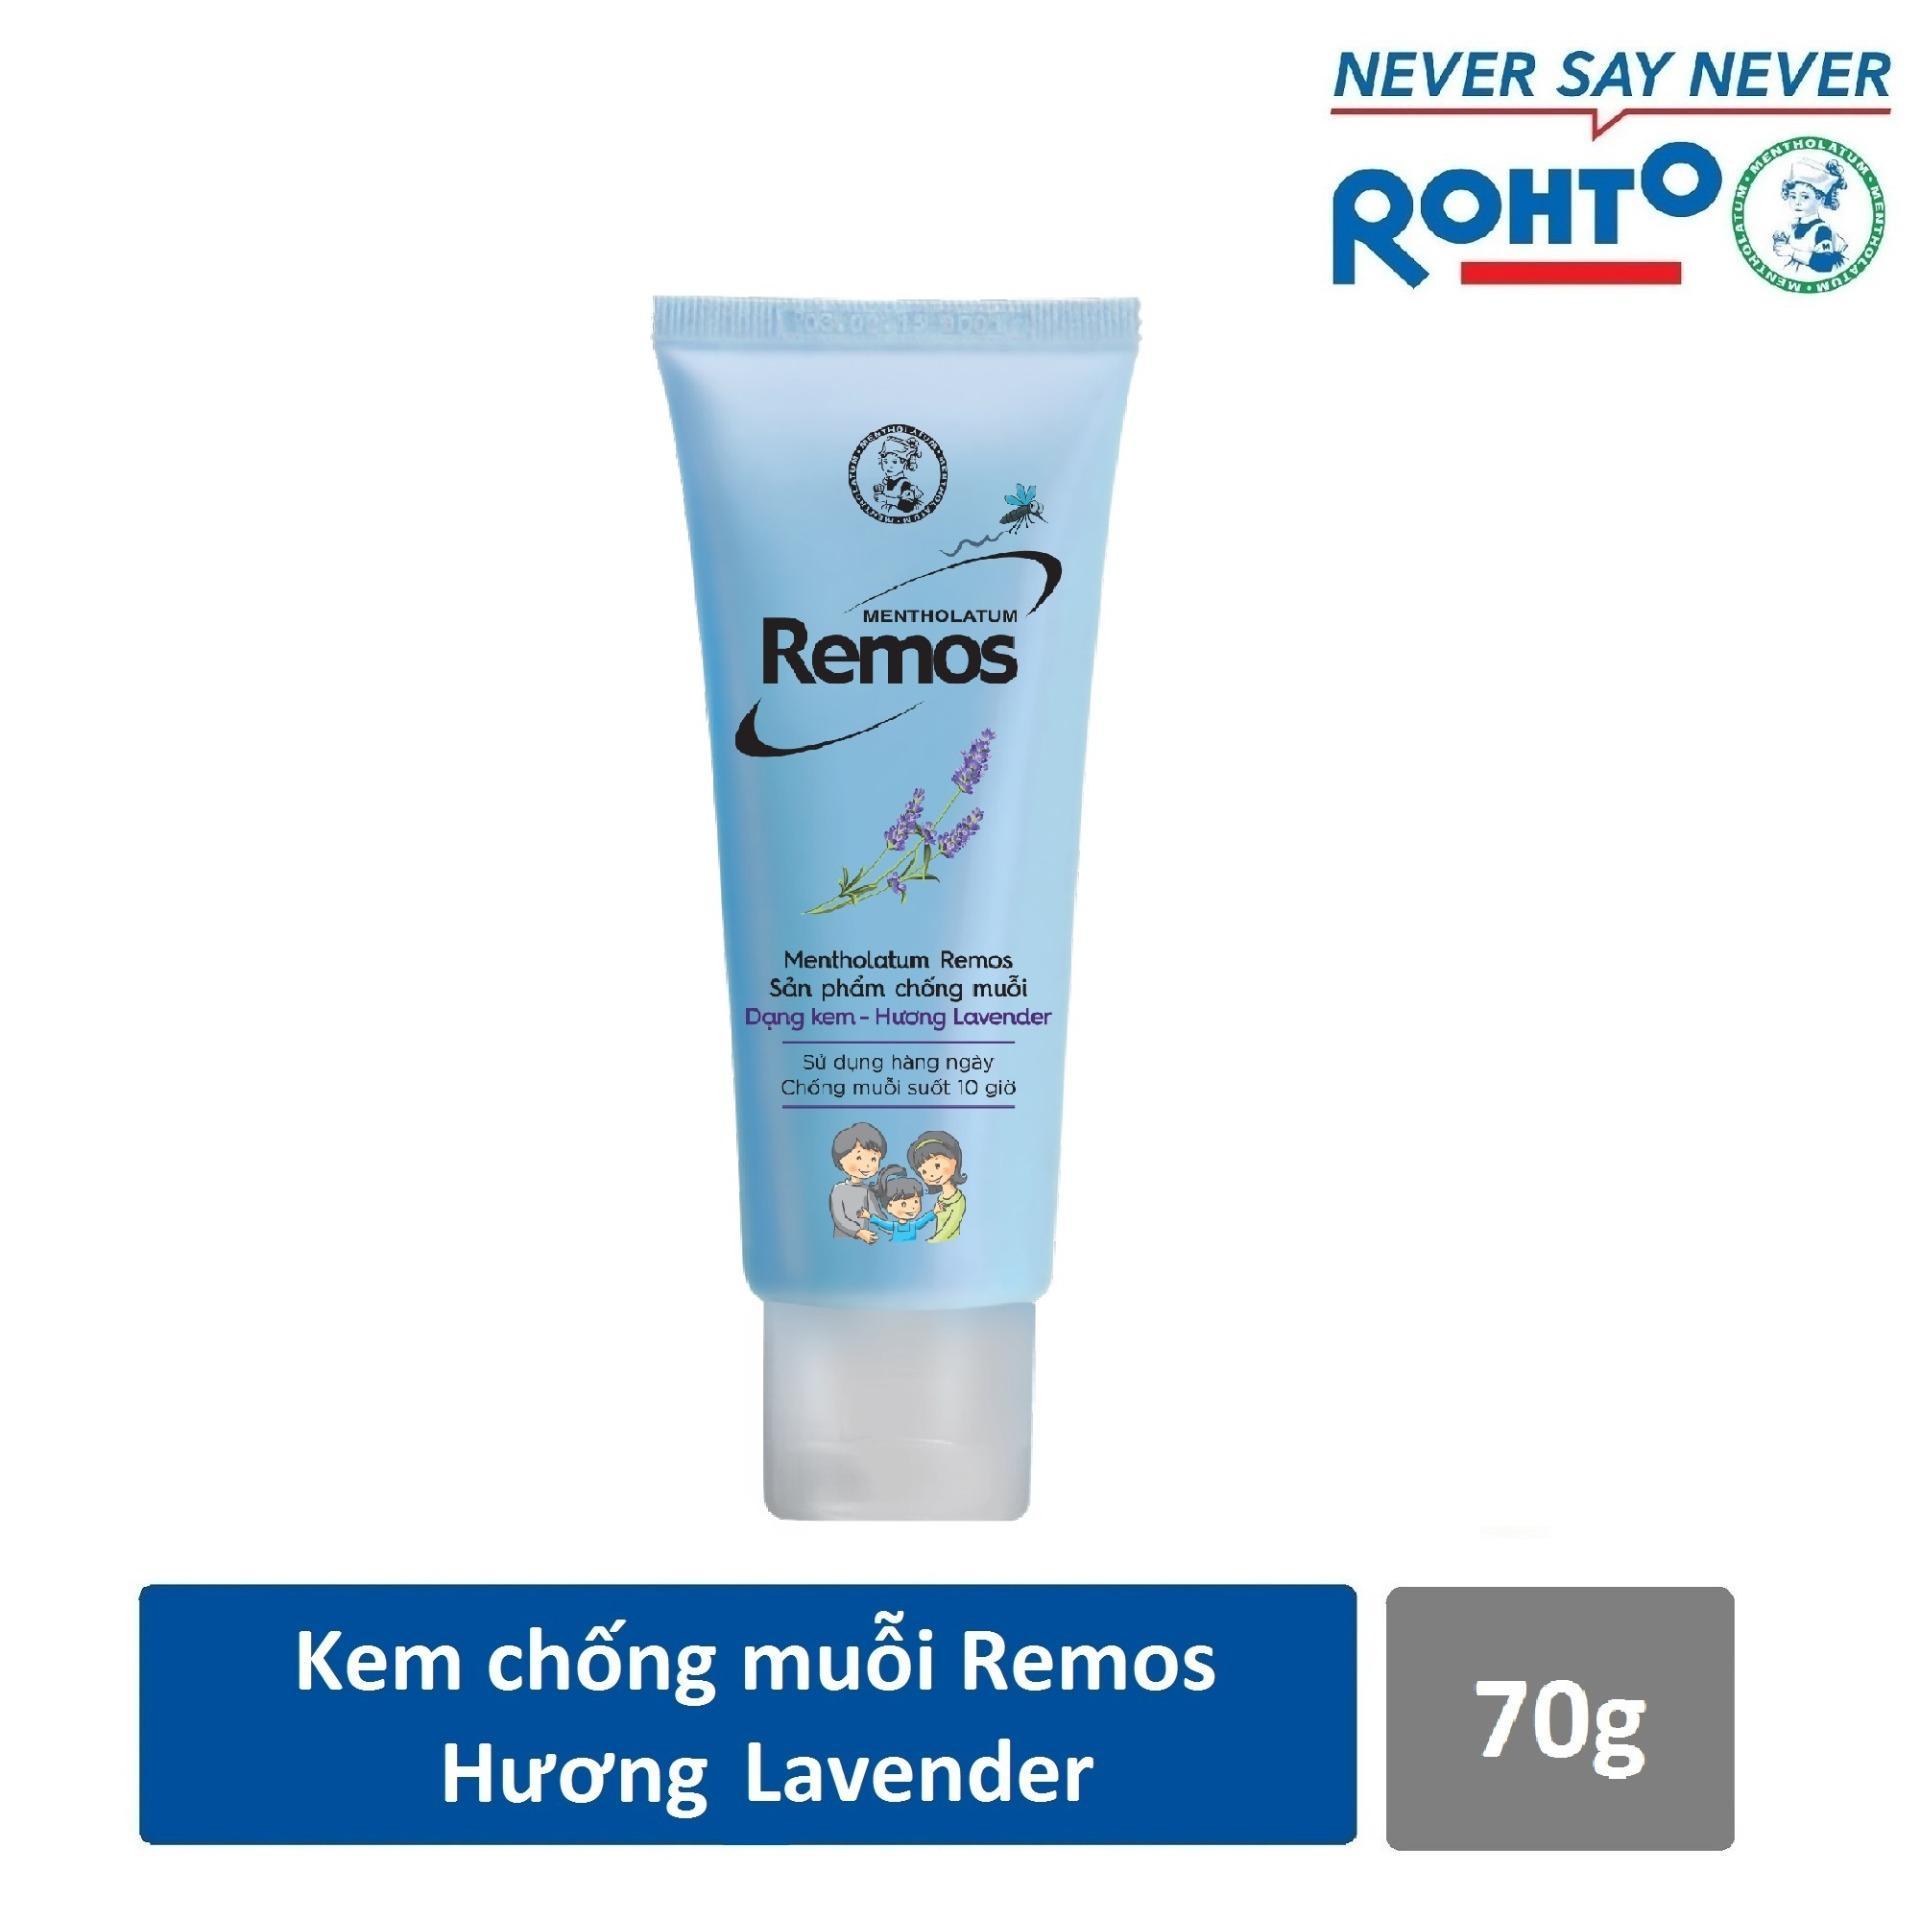 Kem chống muỗi Rohto Metholatum Remos Hương Lavender 70g